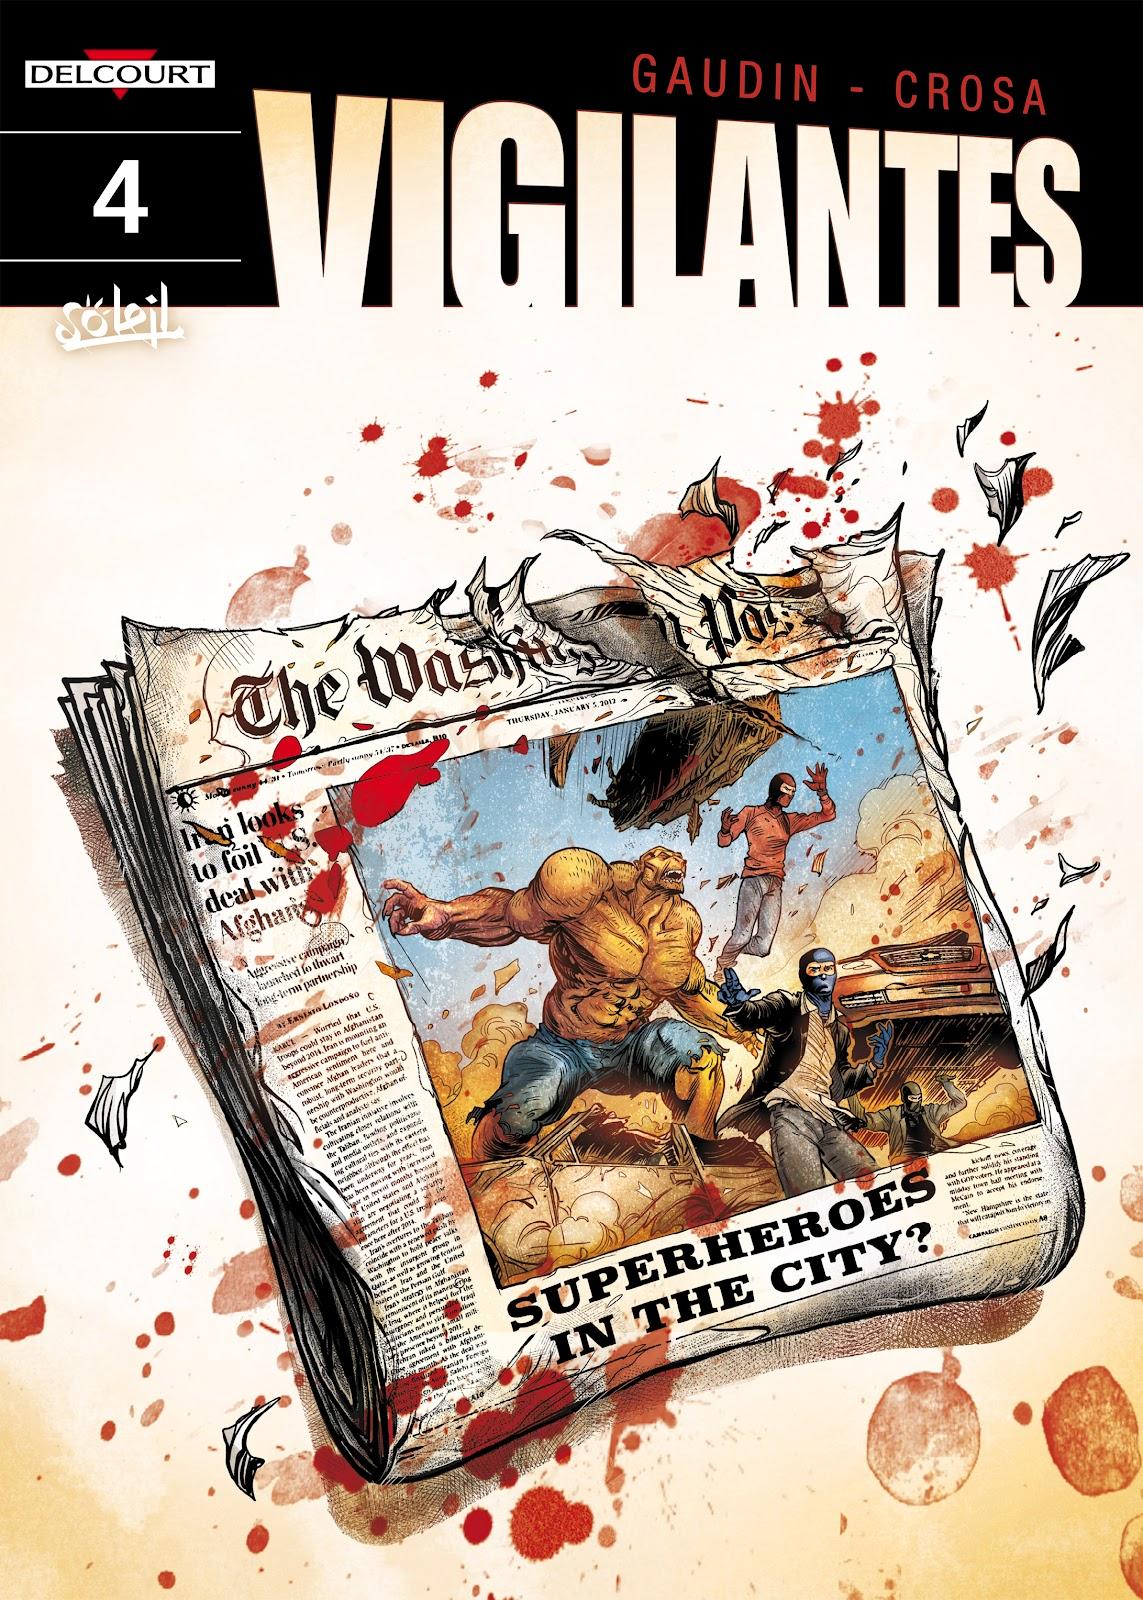 Read online Vigilantes comic -  Issue #4 - 1